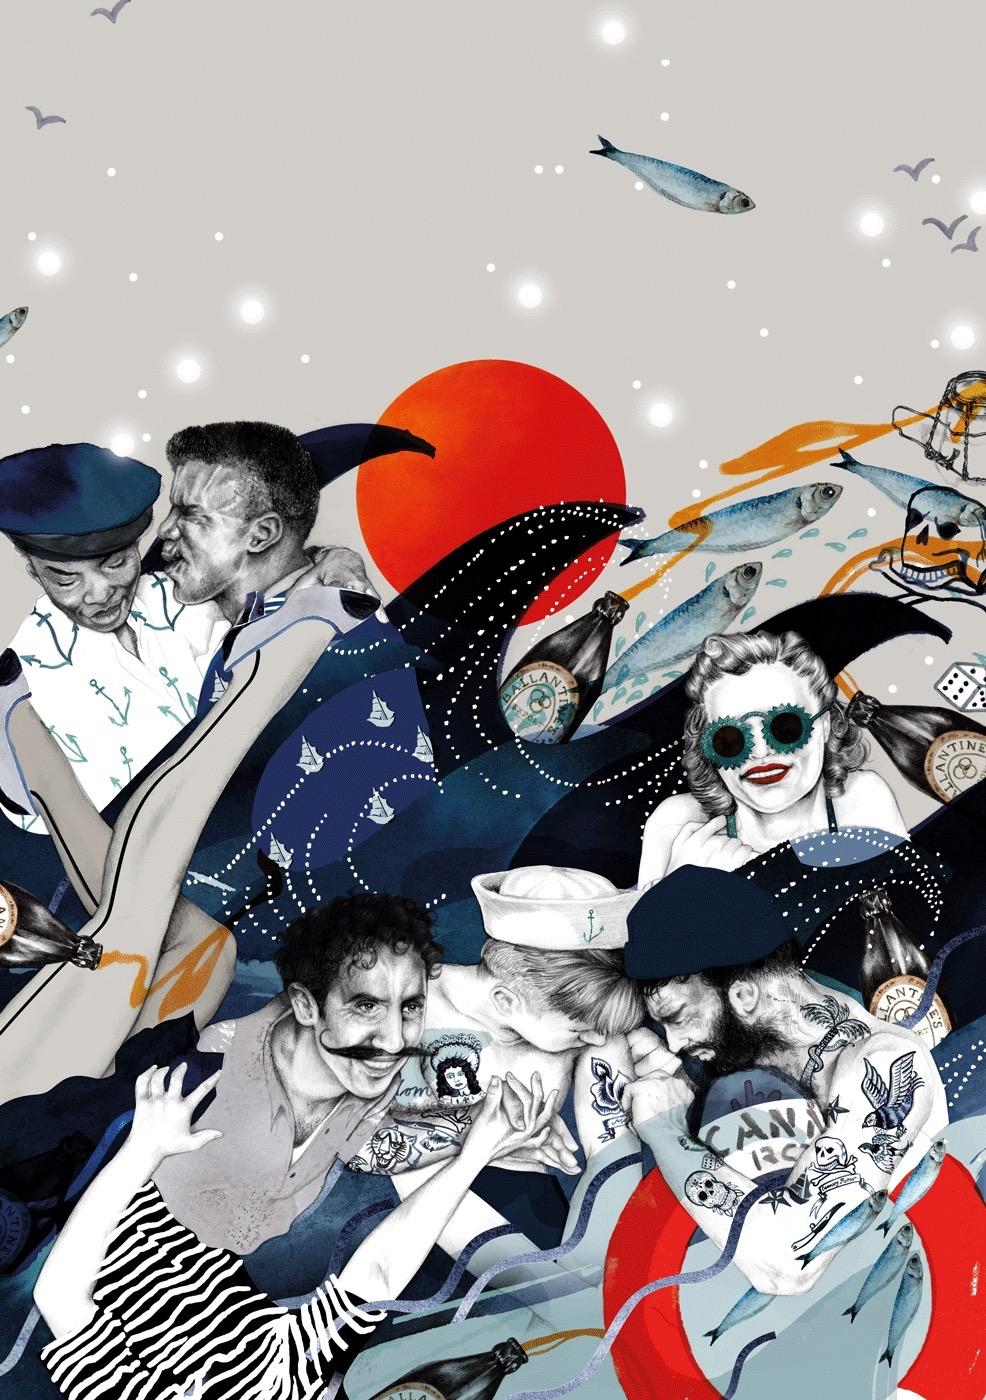 illustrator, illustrators, illustration, illustrations, sailor, sailors, fish, ocean, water, tattoo, woman, women, man, men, sunglasses, anchor, anchors, dice, skull, skulls, bird, birds